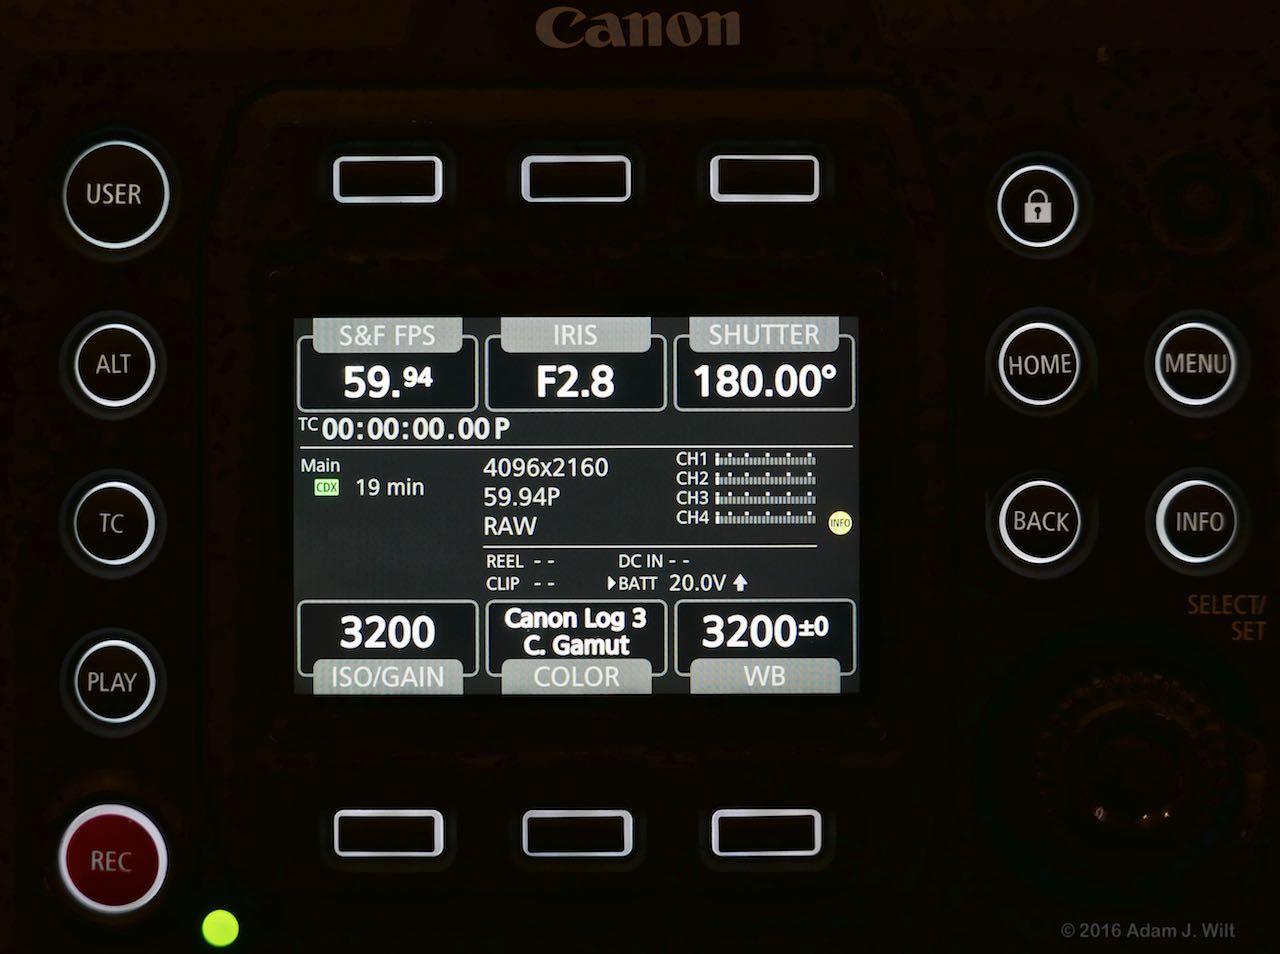 C700 control panel